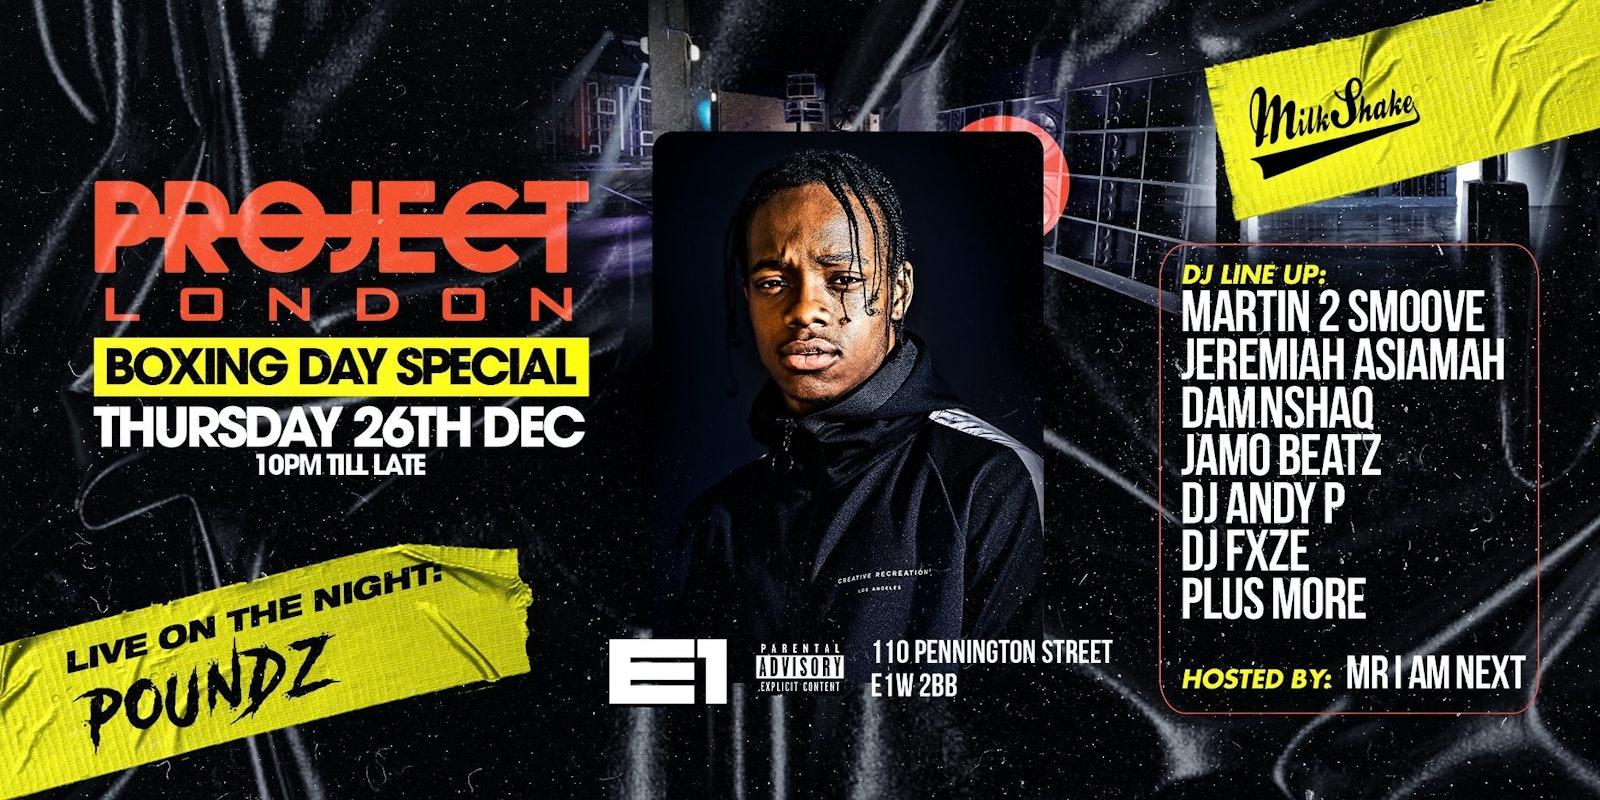 Project London – E1 Warehouse : Boxing Day ft. POUNDZ + More Live